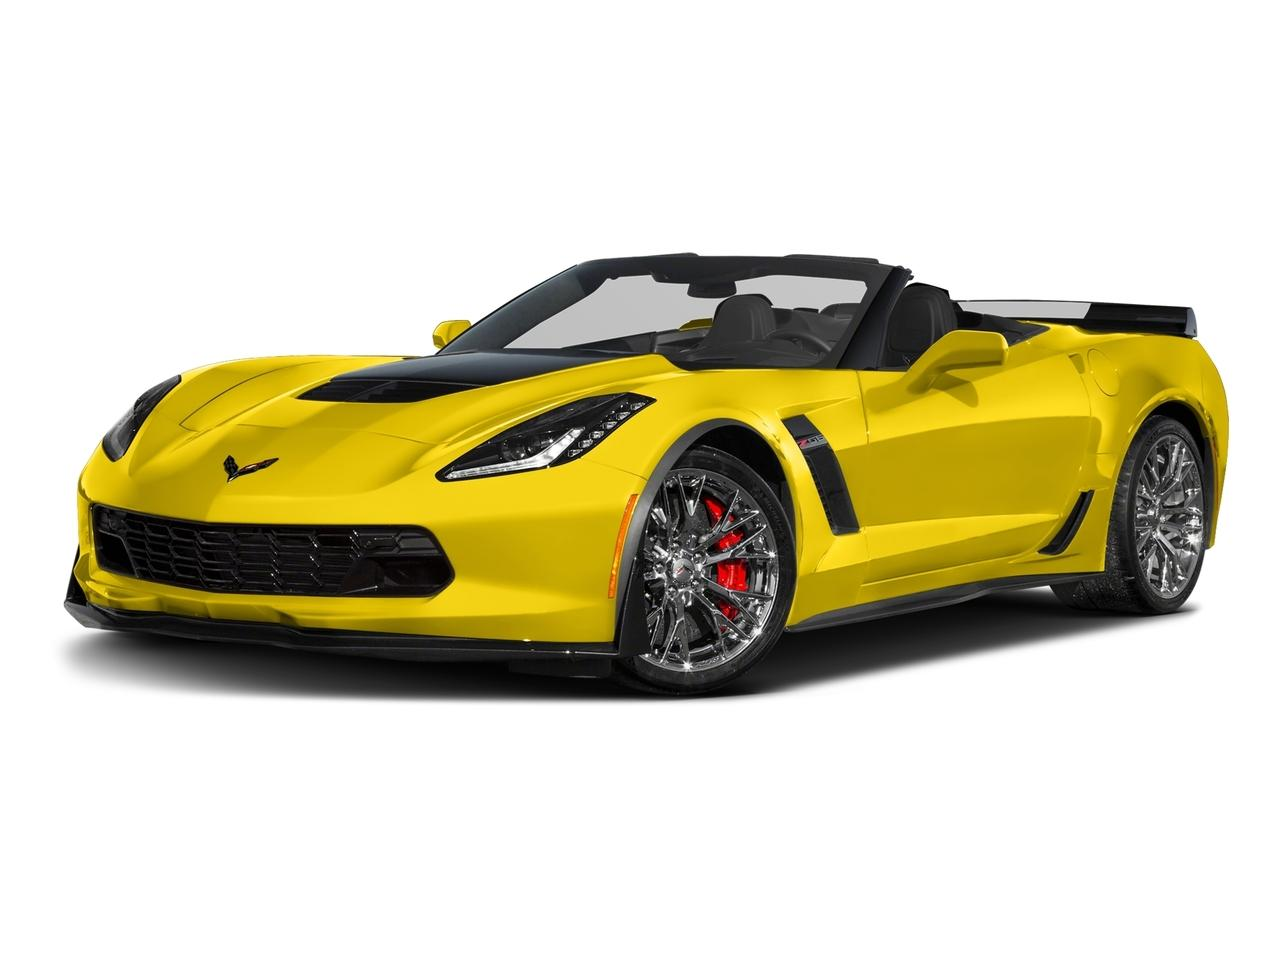 2017 Chevrolet Corvette Vehicle Photo in GREENSBORO, NC 27405-6904